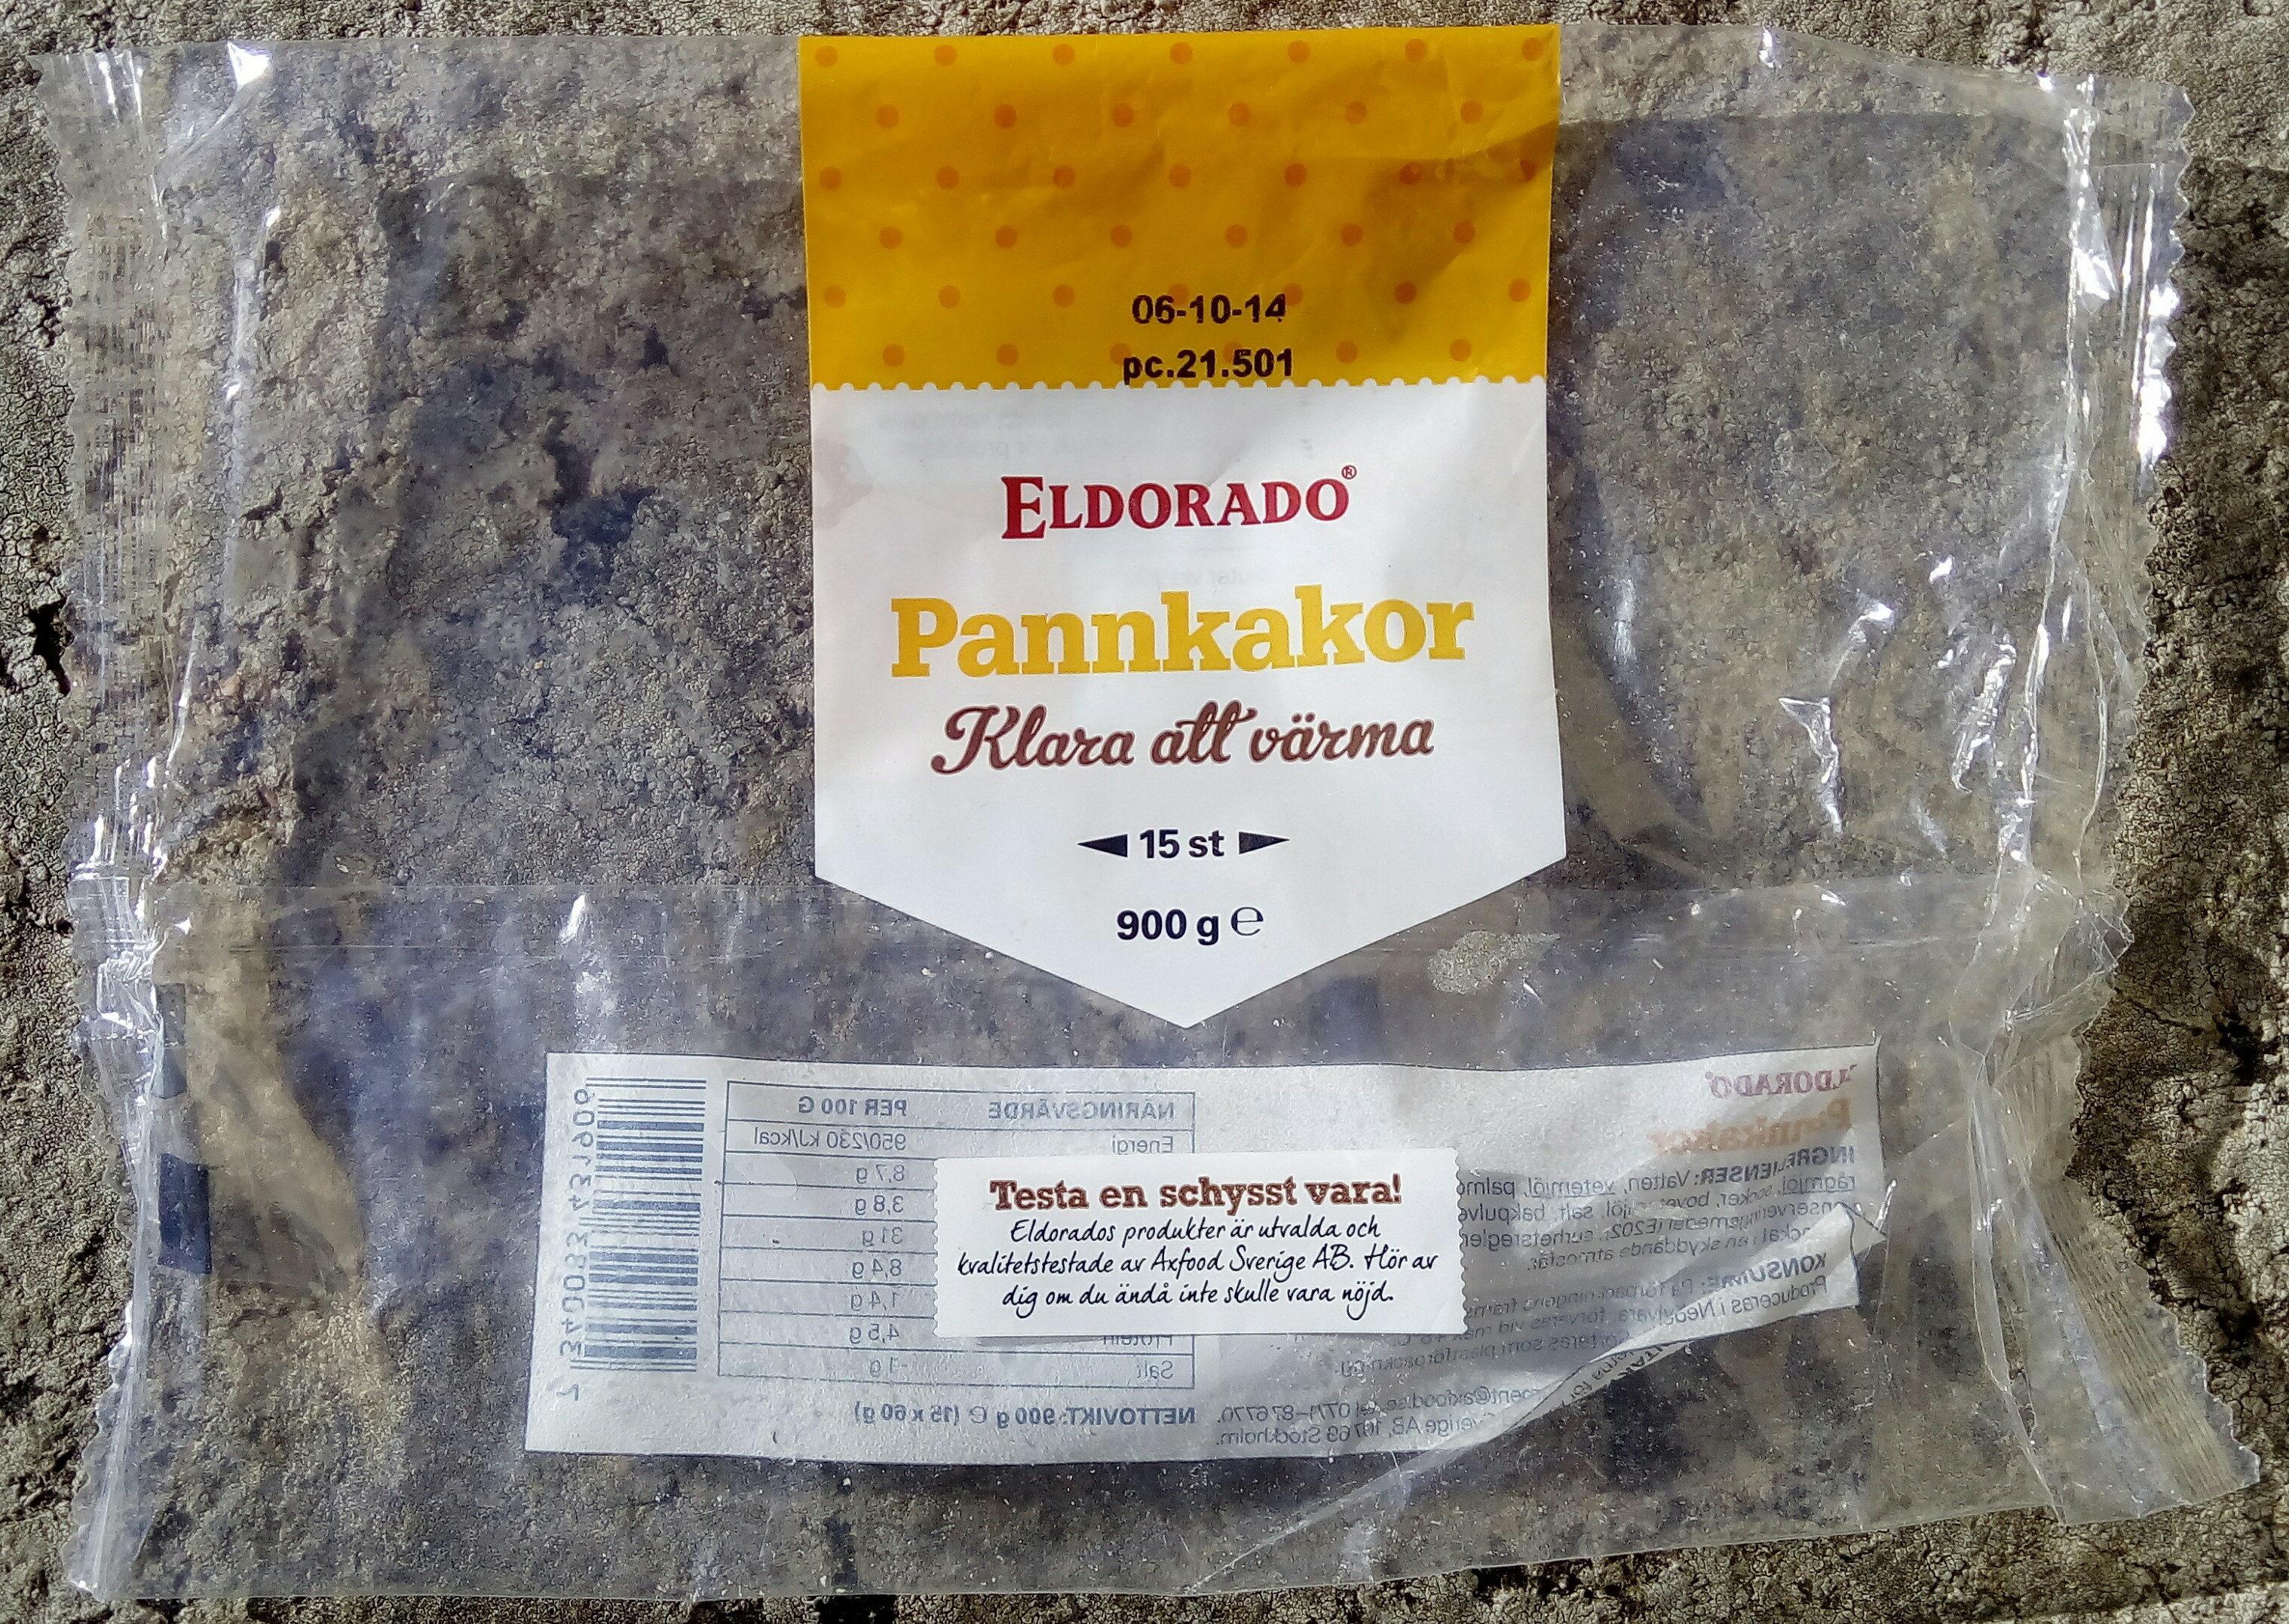 Eldorado Pannkakor - Product